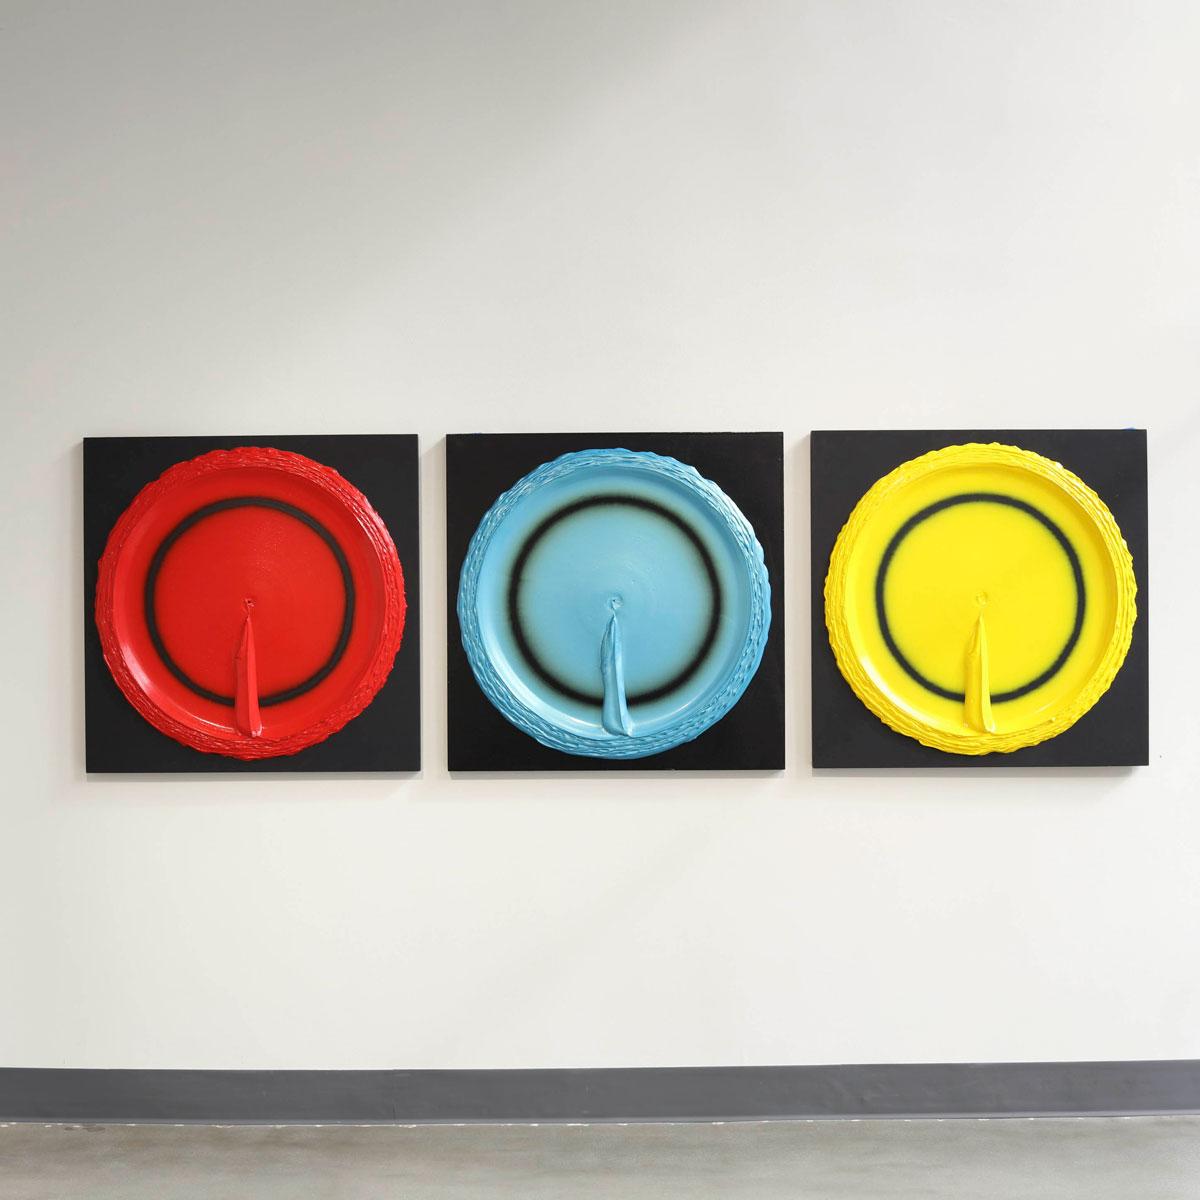 Untitled , 2014, acrylic on panels, 36 x 36 inches (3 panels)